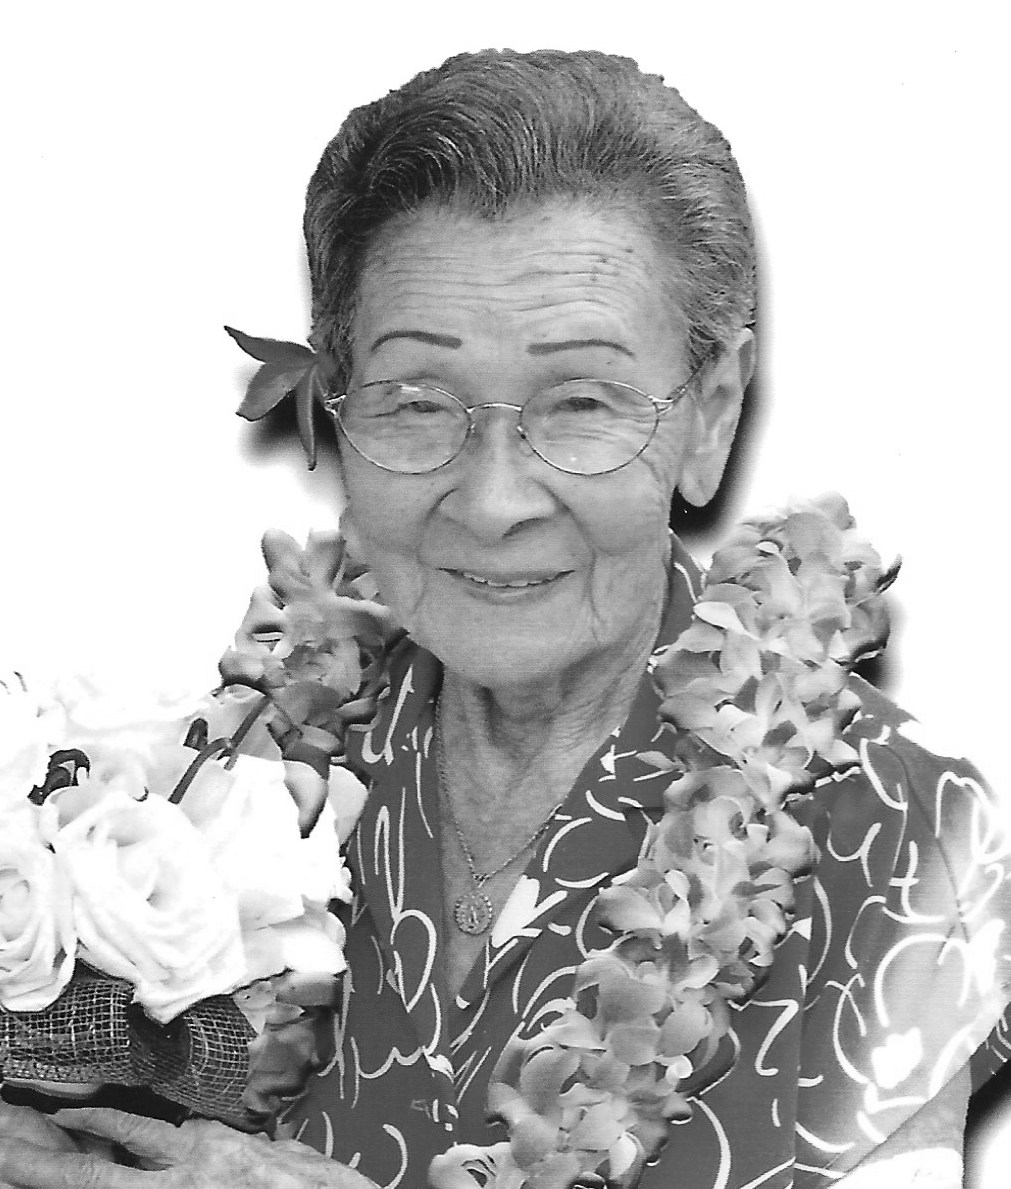 Ethel Kazumi Yonemitsu